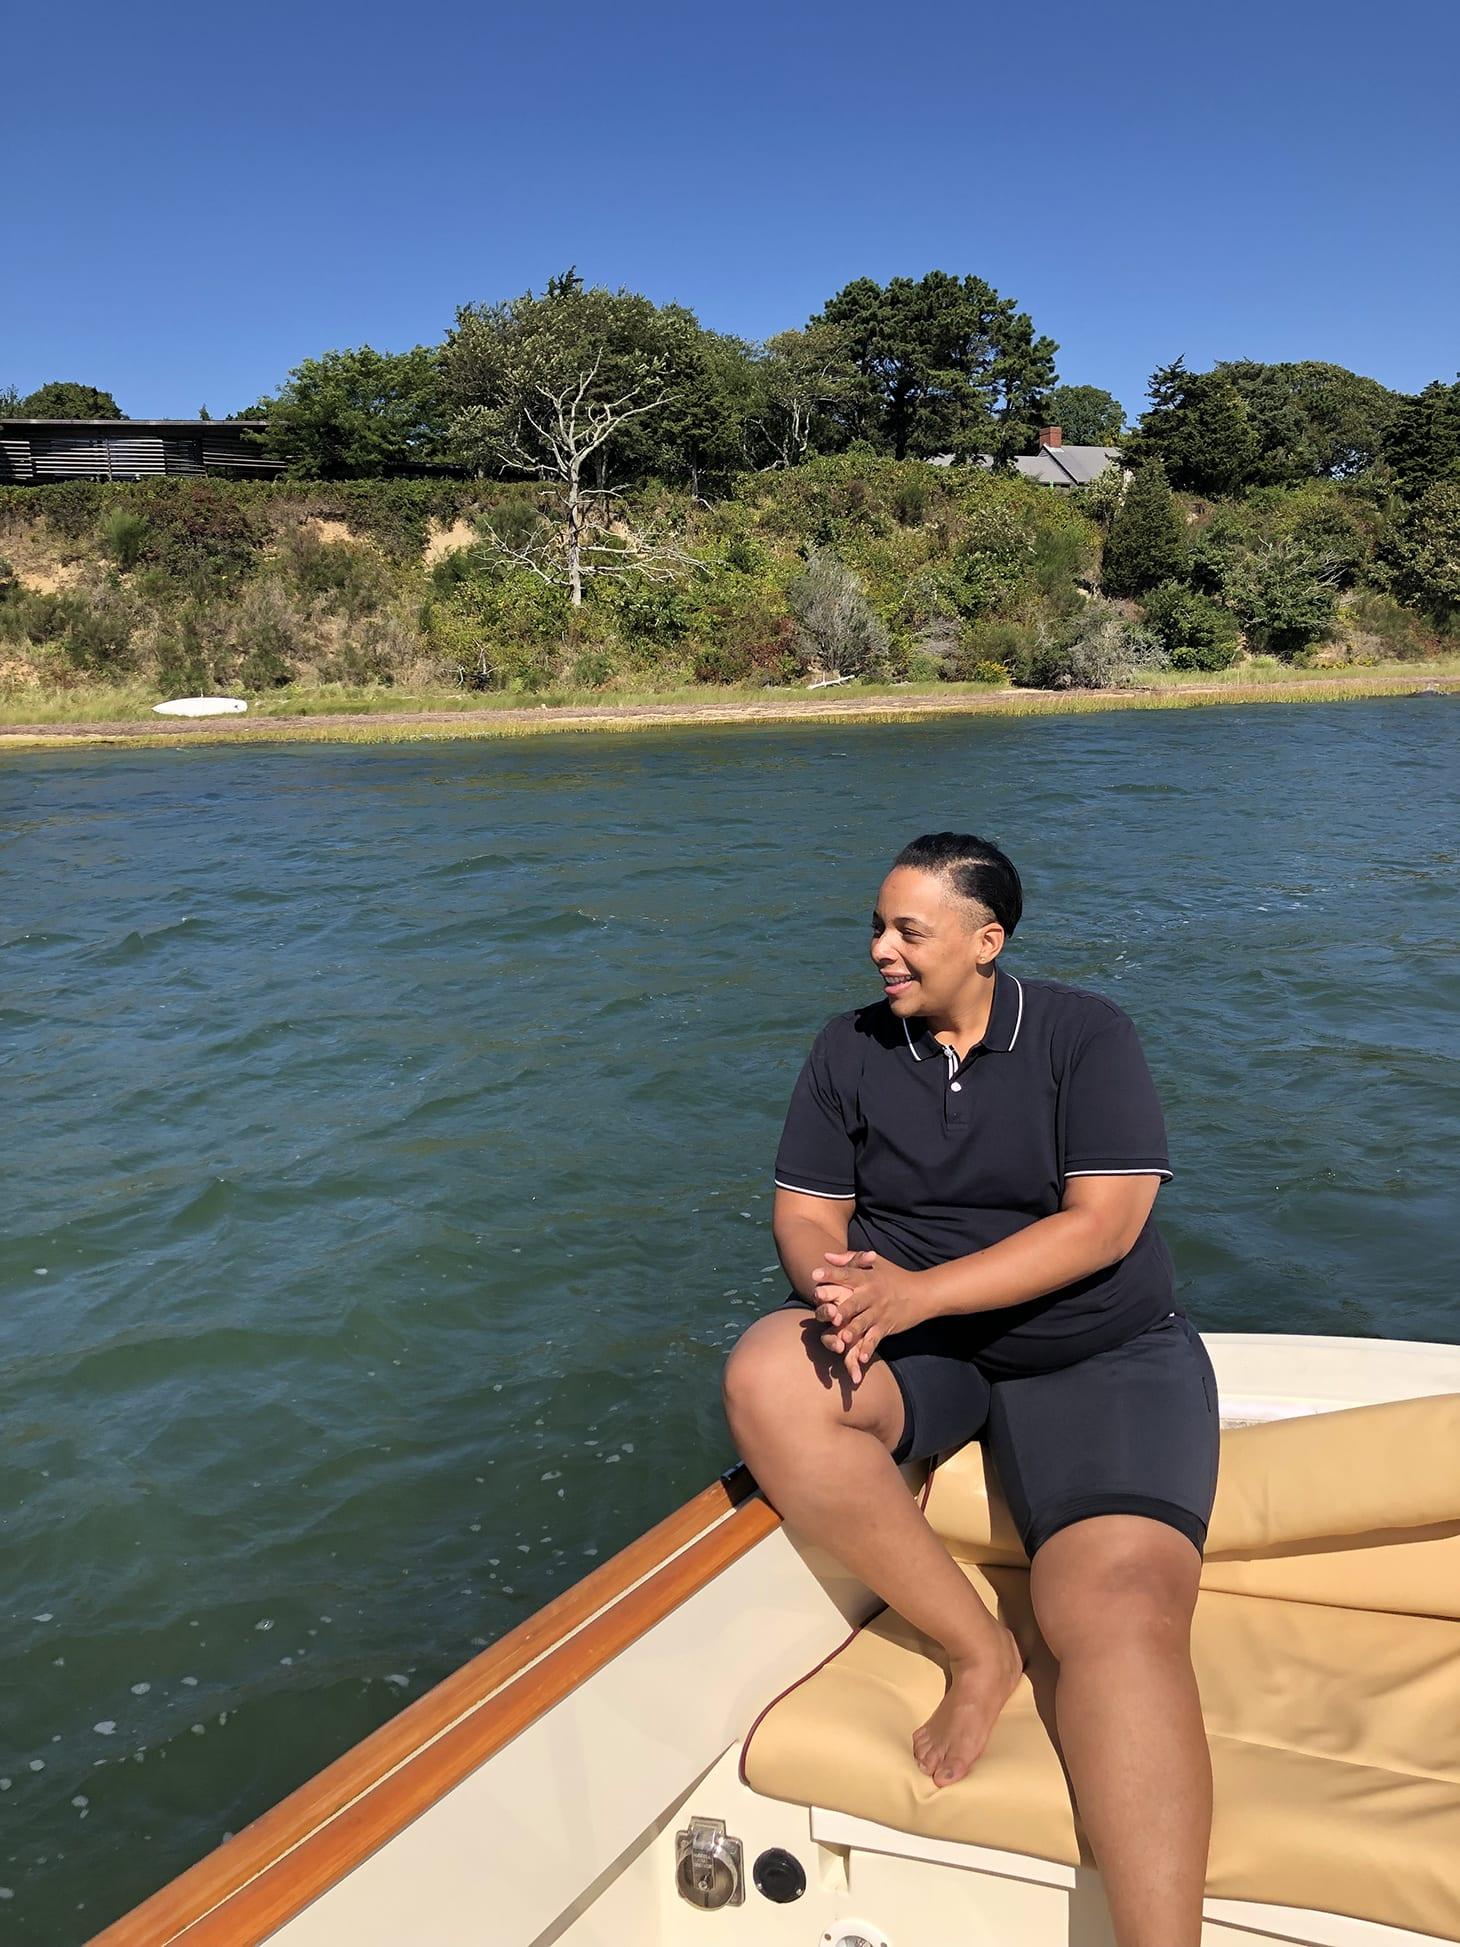 Health and Wellness coach, Coach Carey on a boat on a lake.